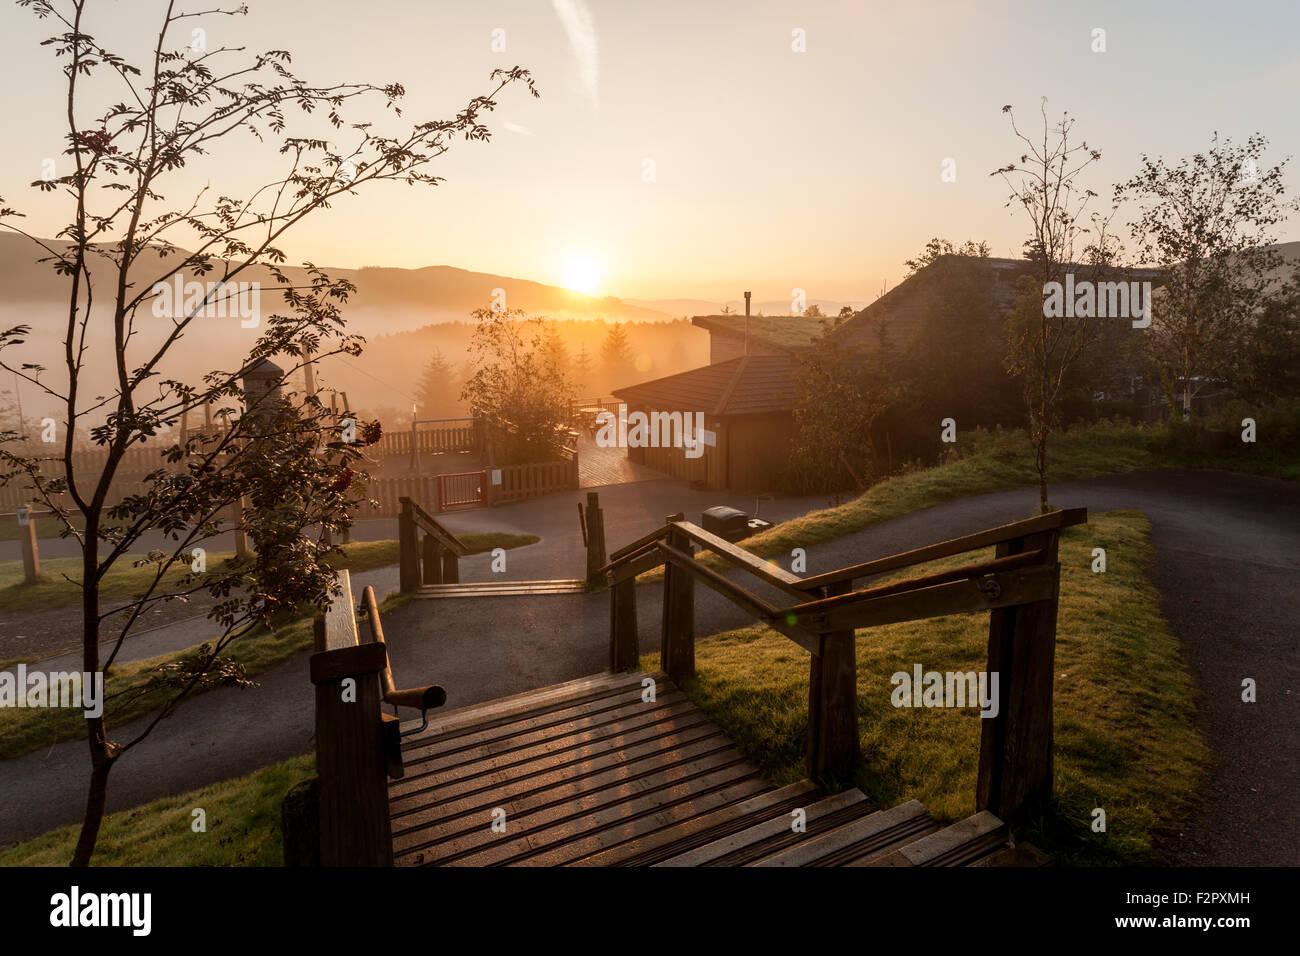 Sunrise over Bwlch Nant Y Arian  Ceredigion Mid Wales UK Stock Photo